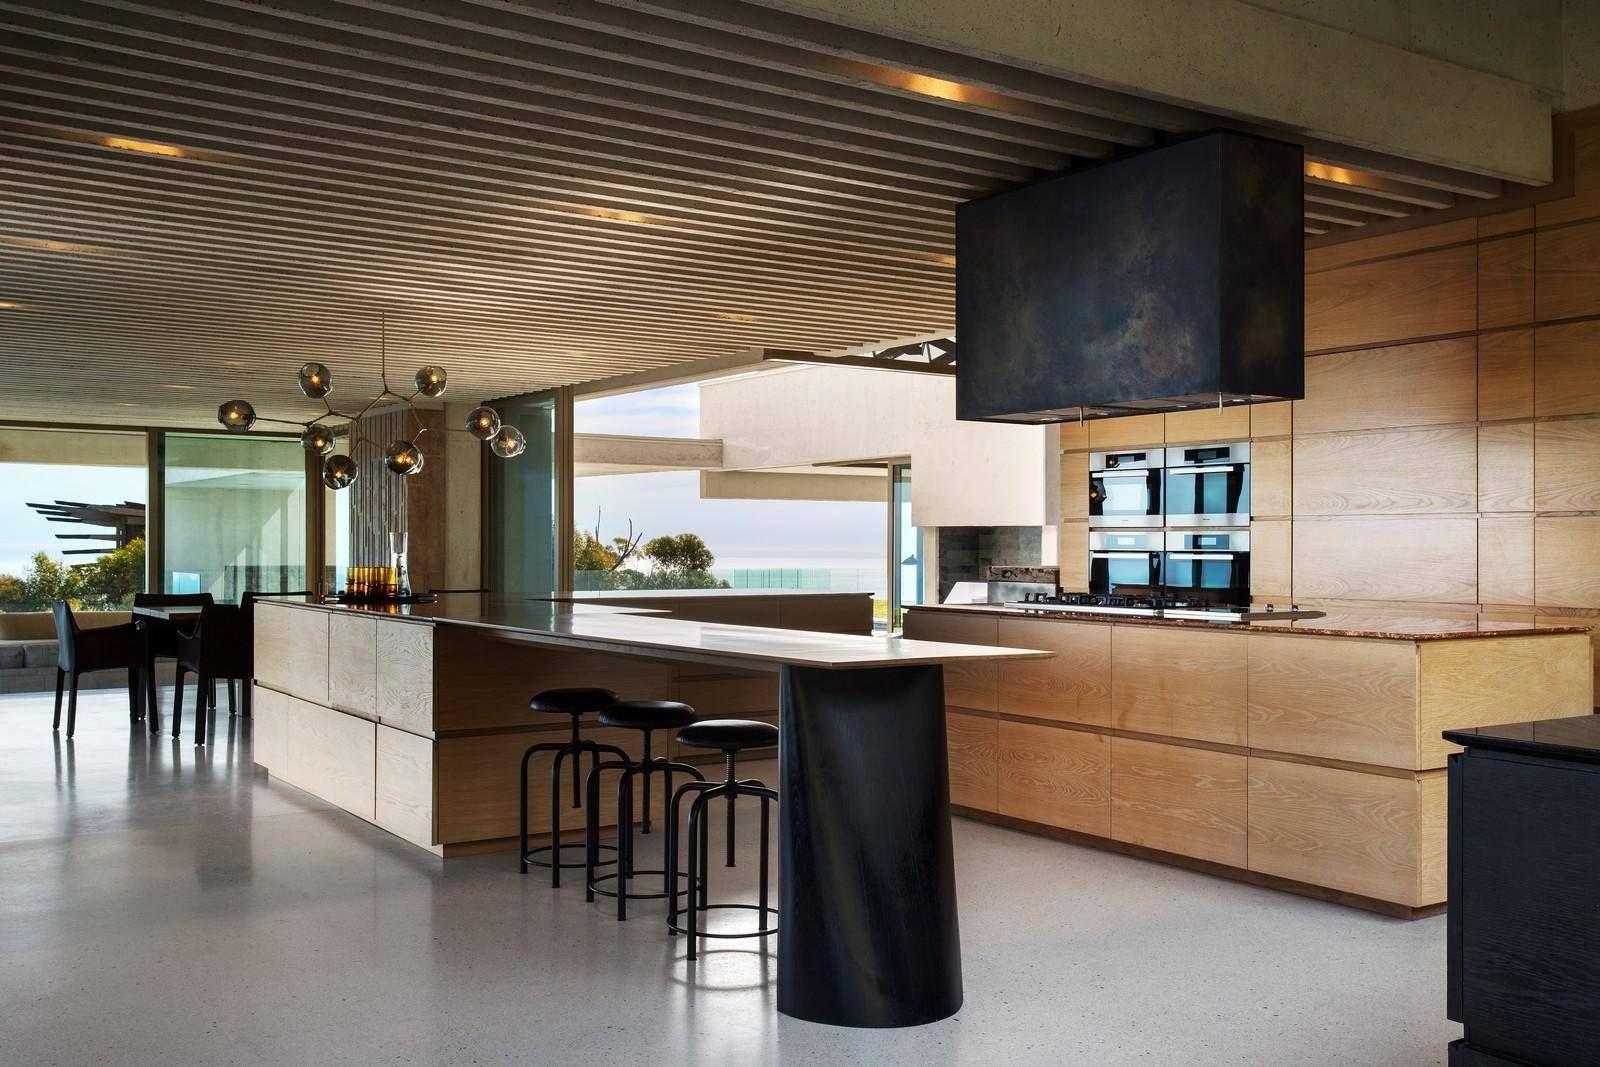 Pin by stephanie vargas on decor pinterest kitchen modern